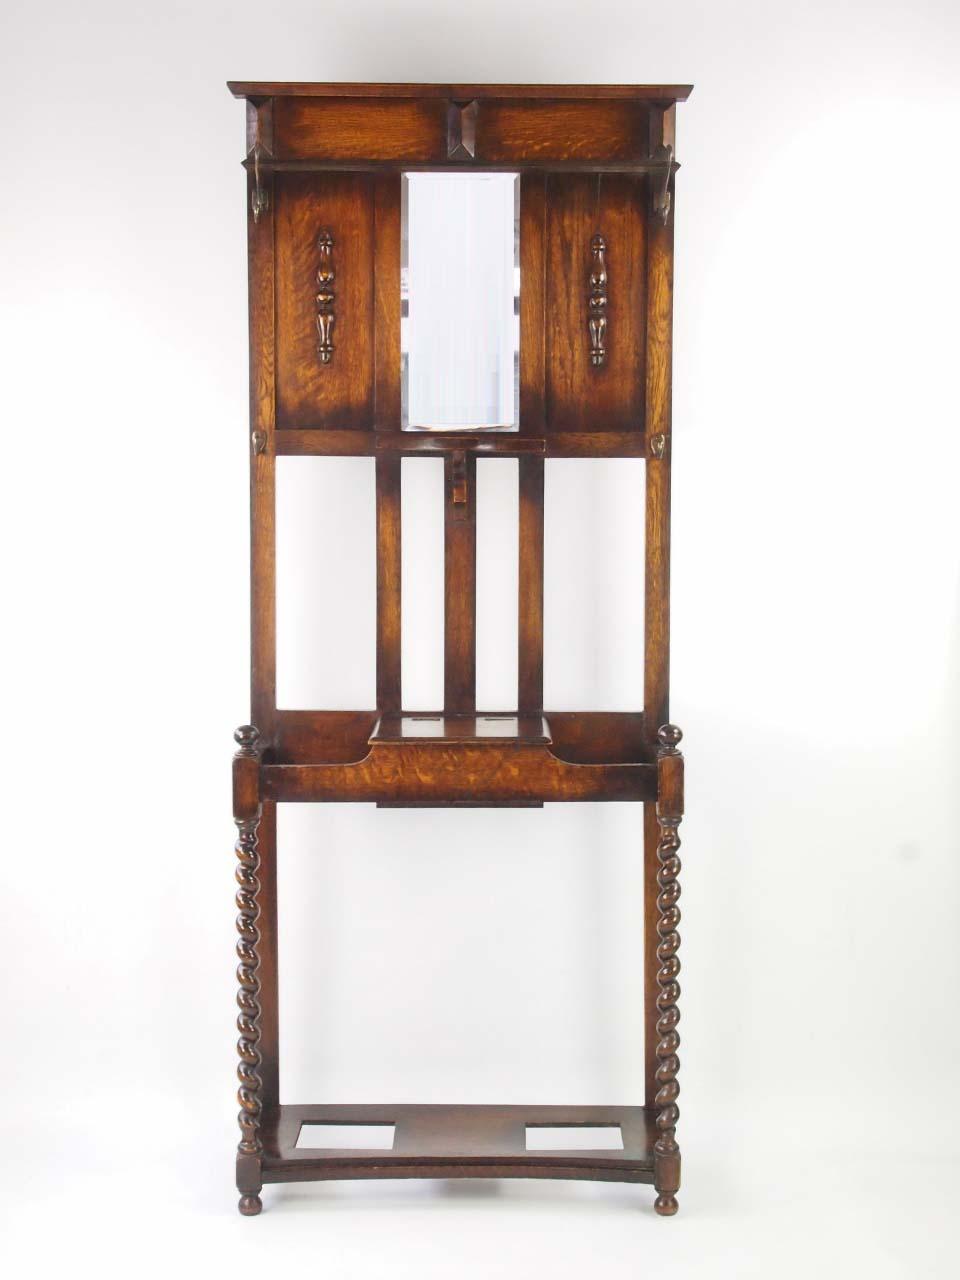 1920s Oak Hall Stand Vintage Hall Stands For Sale Online